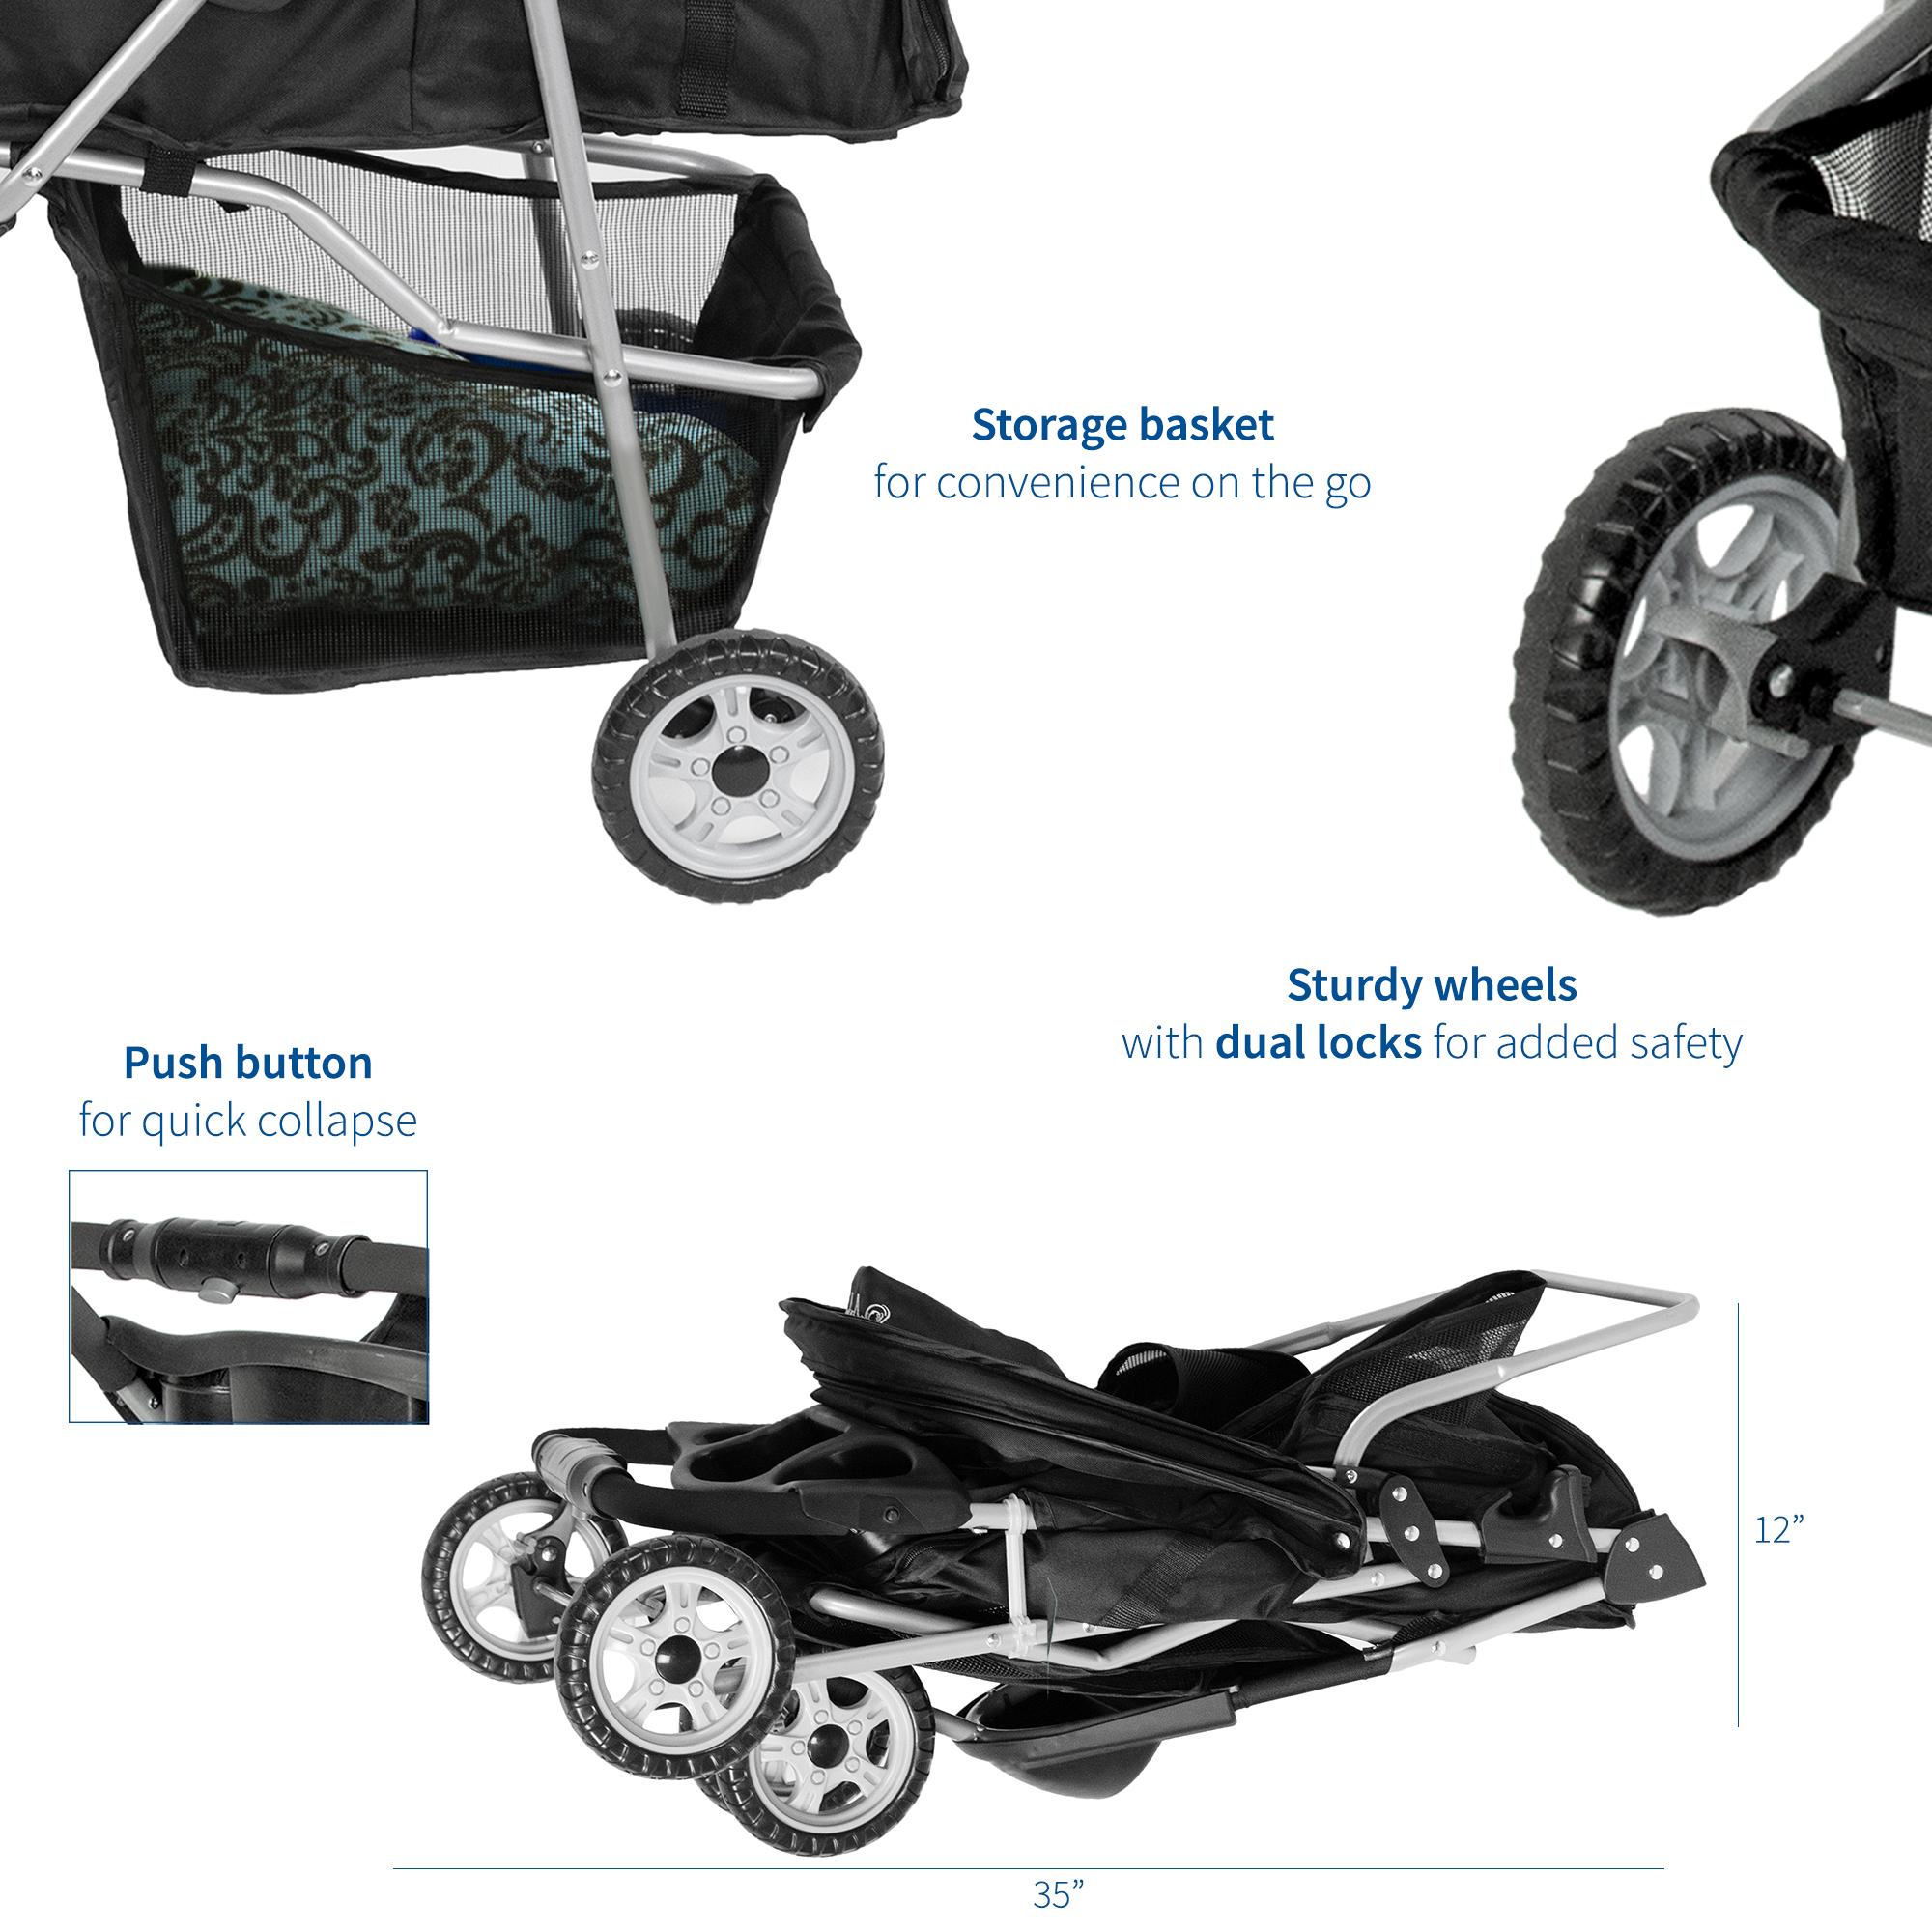 thumbnail 5 - VIVO Three Wheel Pet Stroller / Cat & Dog Foldable Carrier Strolling Cart